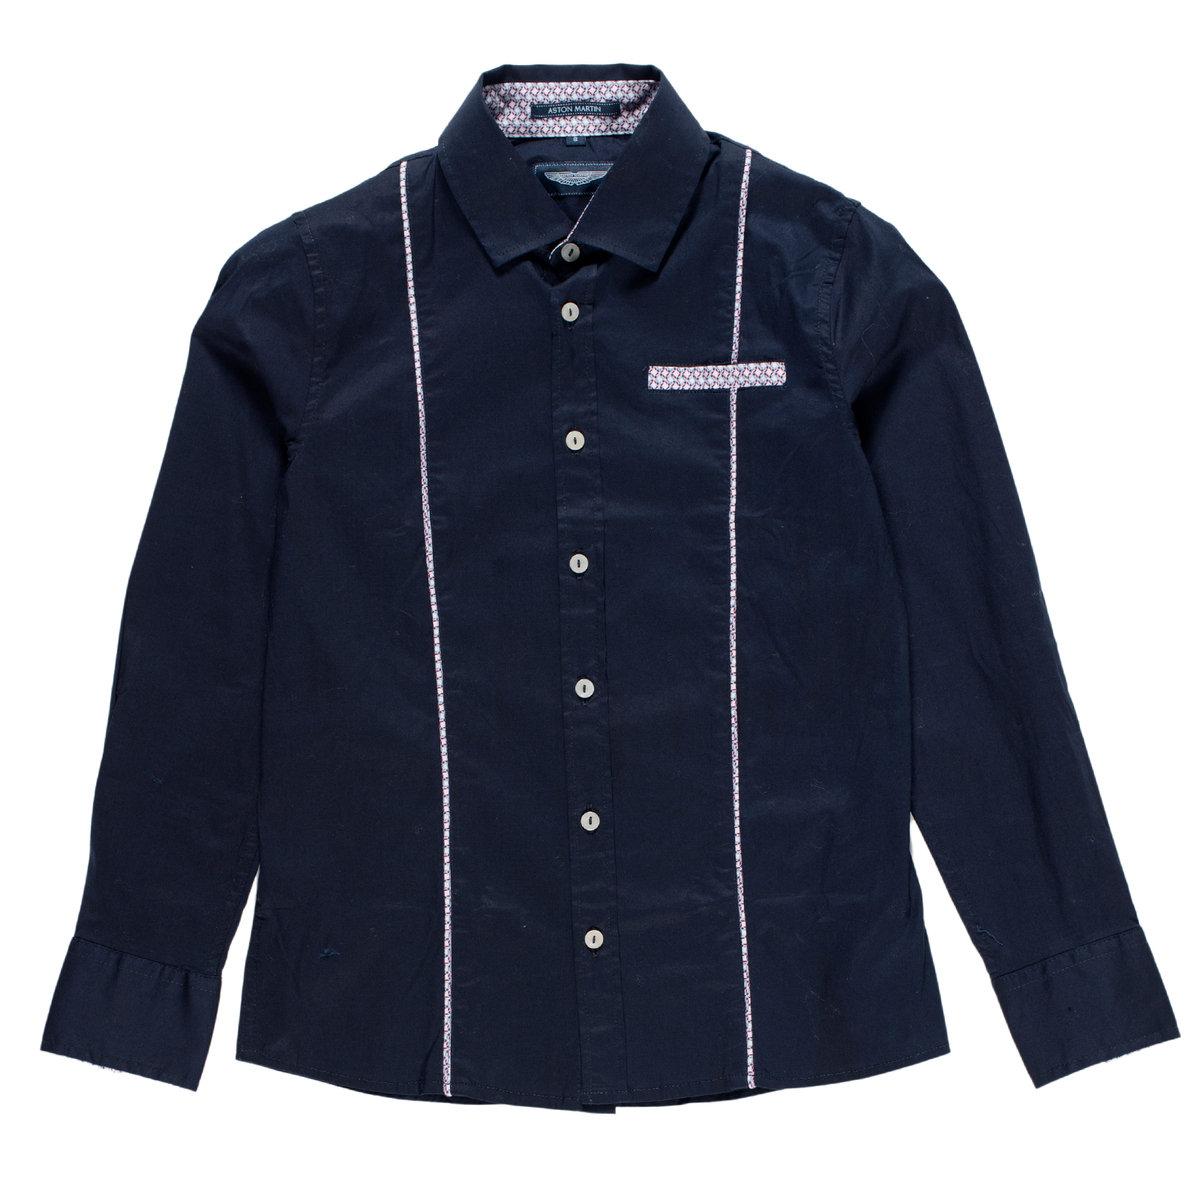 Boys Dark Blue Shirt Aston Martin TShirts Shirts Polos - Aston martin shirt